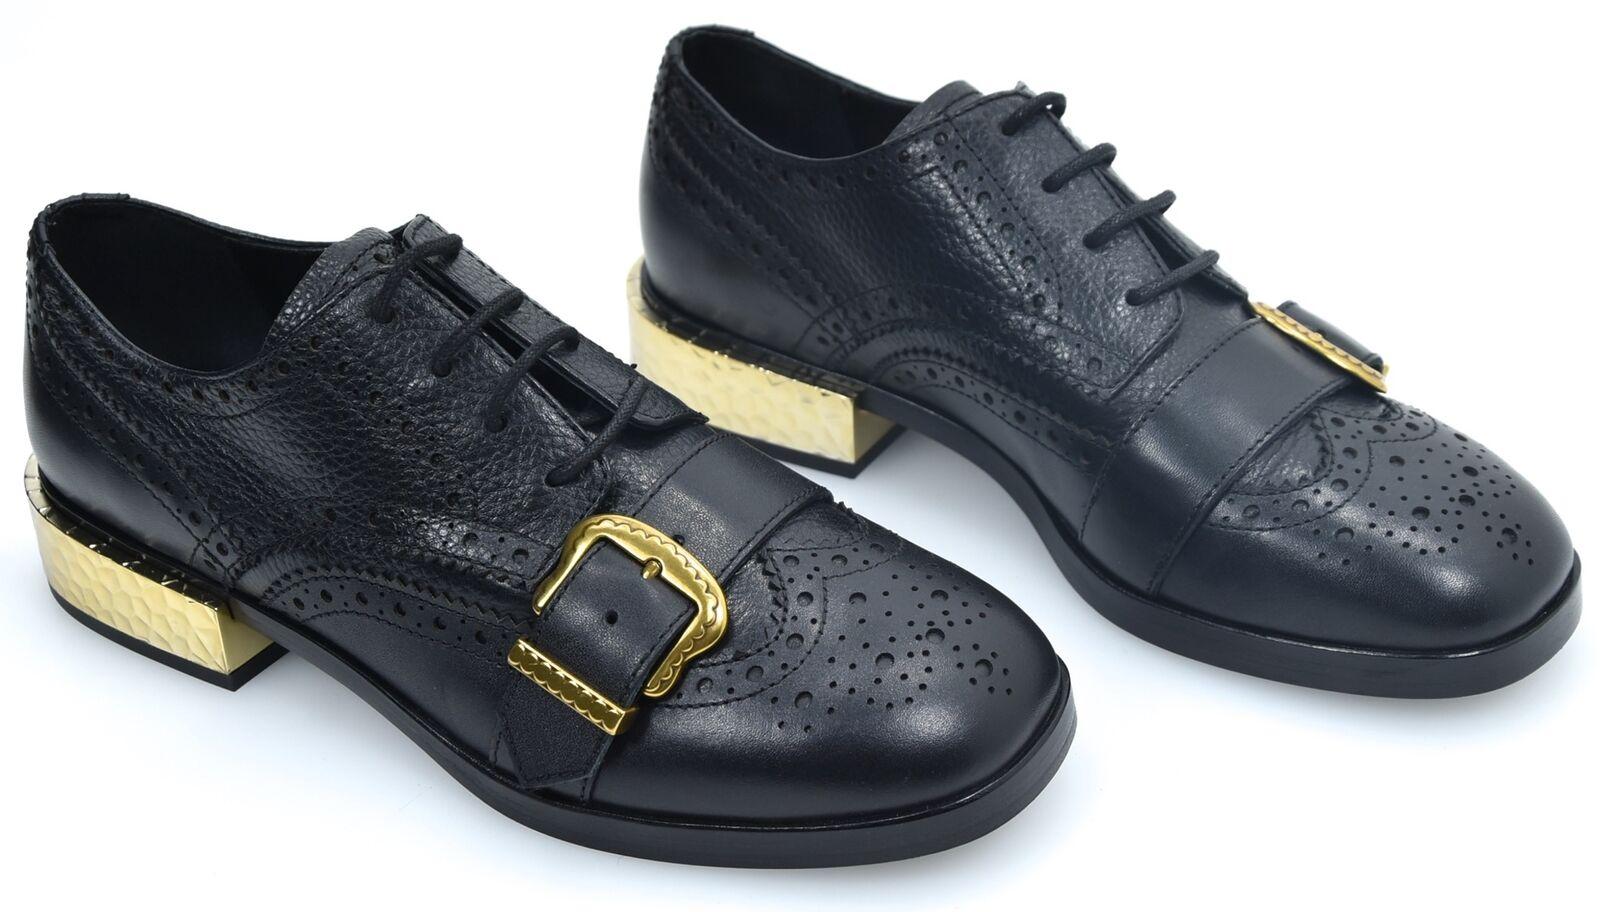 ASH WOMAN CLASSIC DERBY schuhe schwarz schwarz schwarz LEATHER CODE SS18-M-122650-001 FREAK 813009